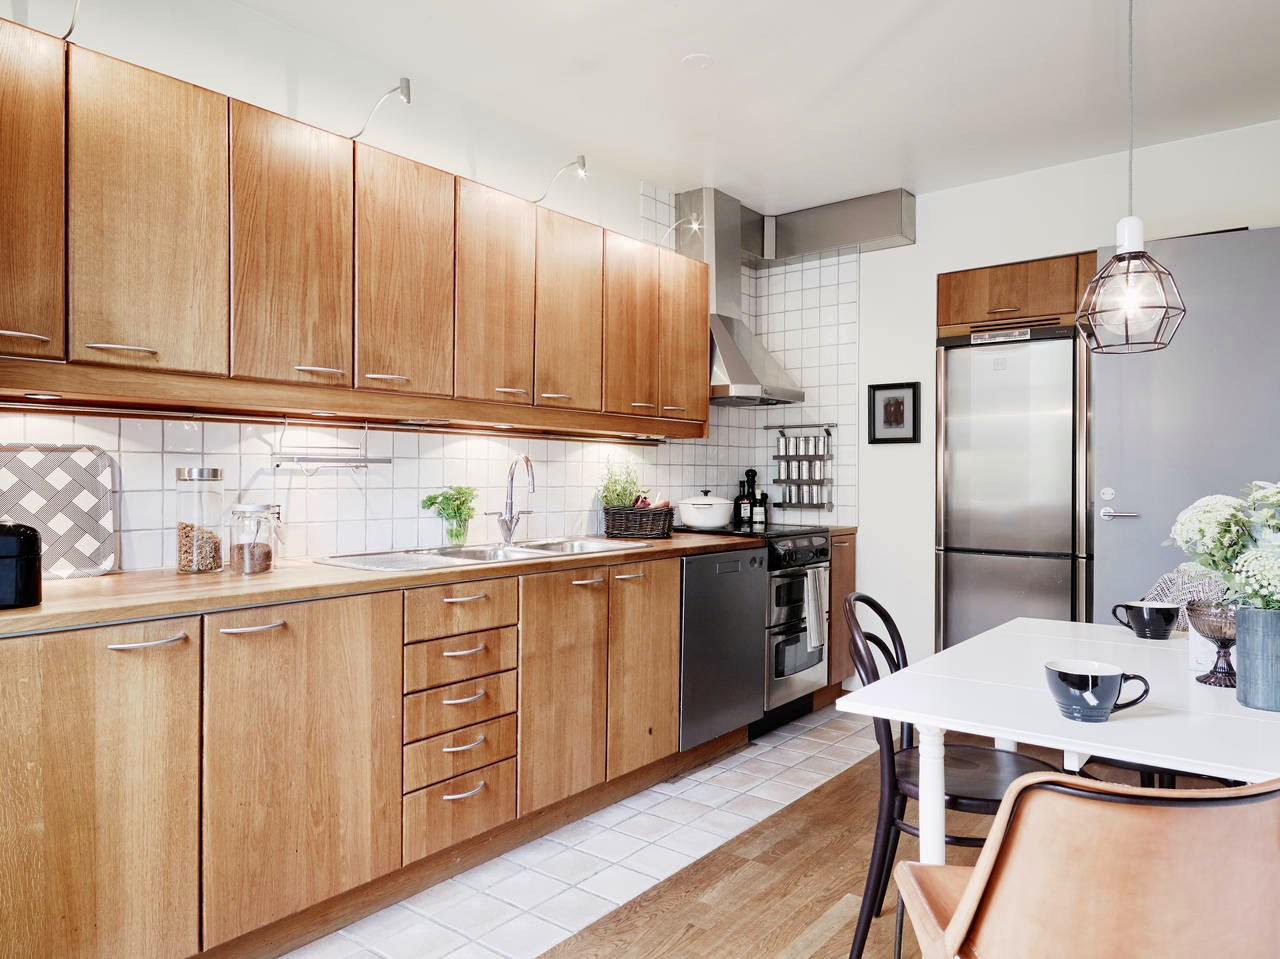 ideas-deco-cocinas-integradas-salon-comedor